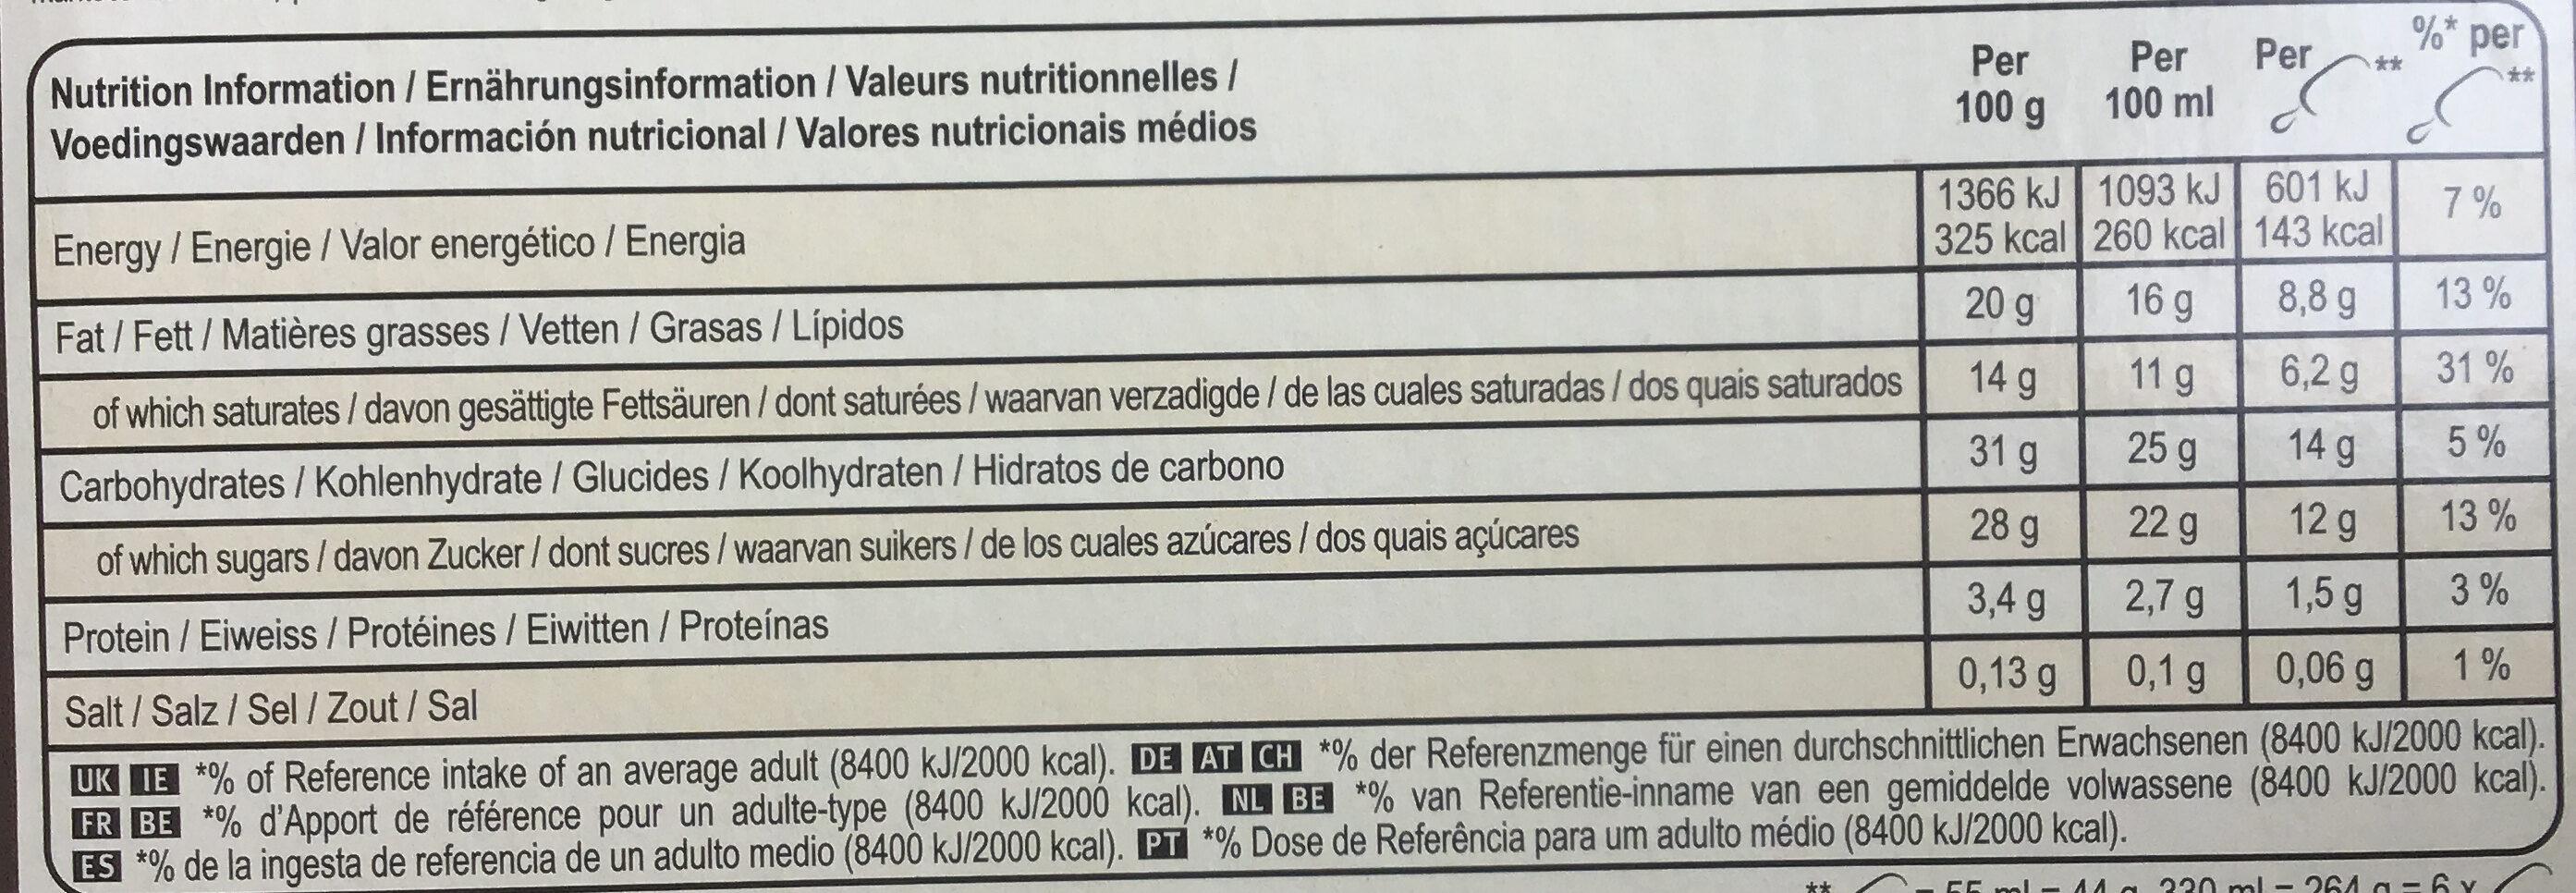 Magnum Glace Bâtonnet Mini Classic x6 330ml - Informação nutricional - fr